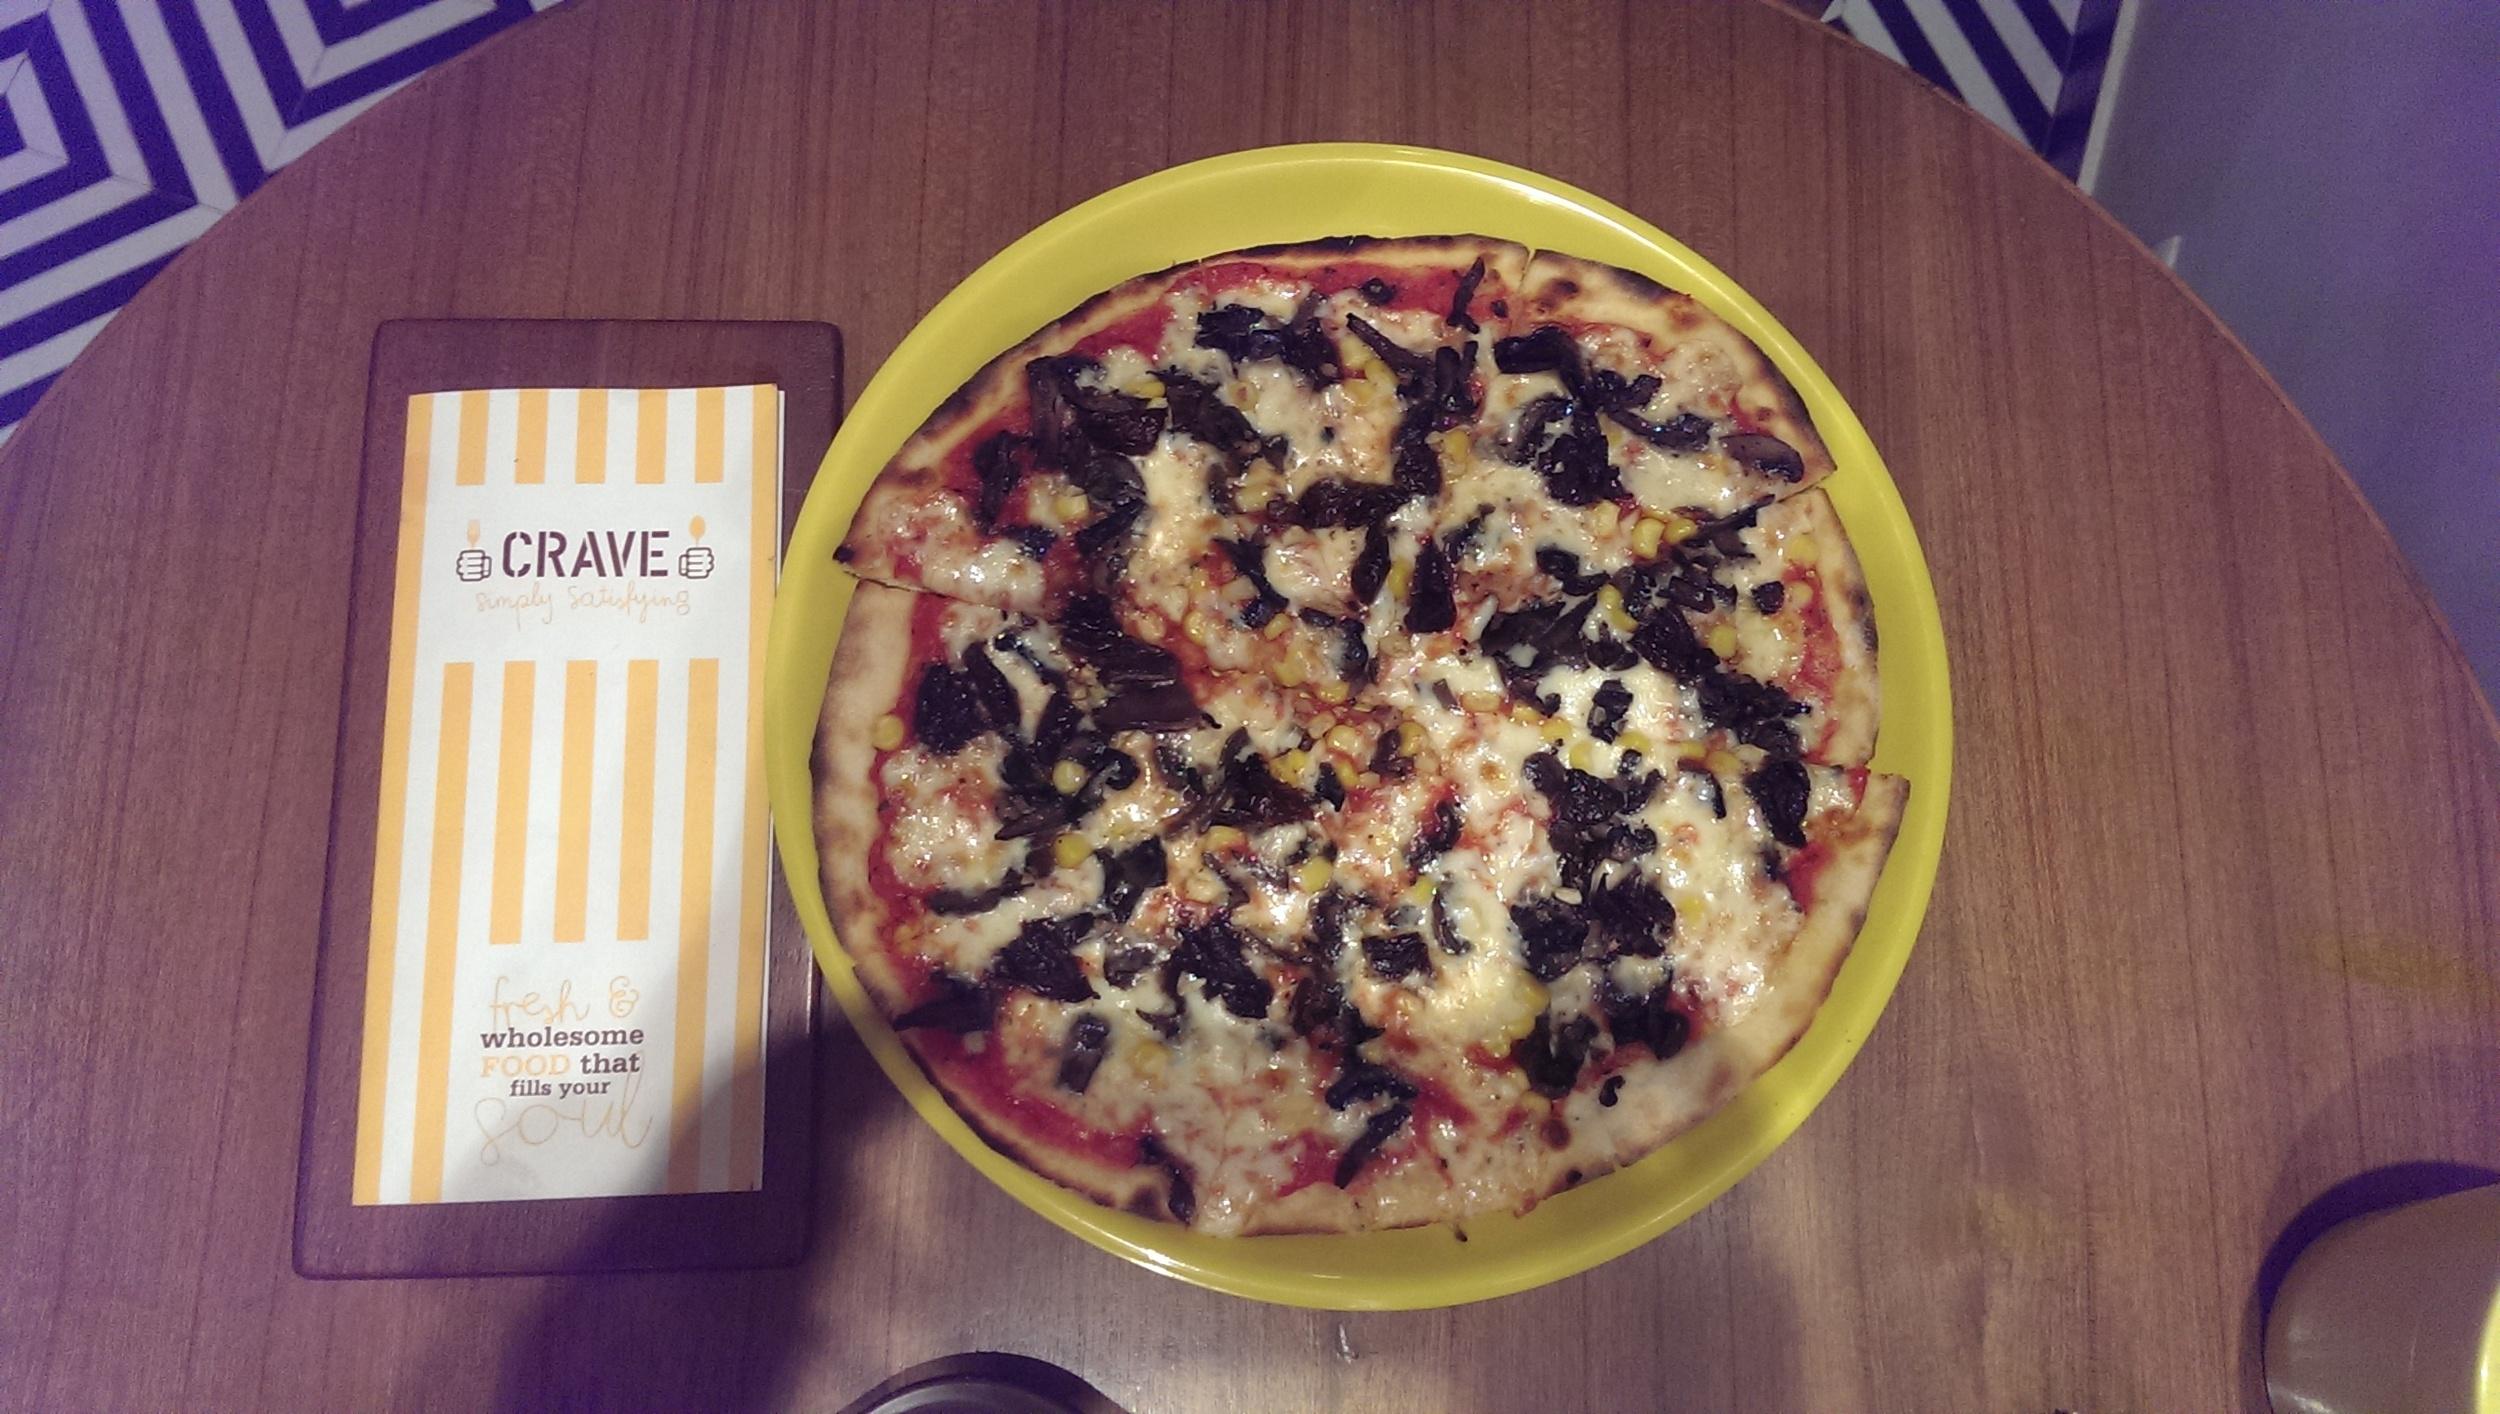 Secret Garden Pizzeria @ Crave, Prabhadevi